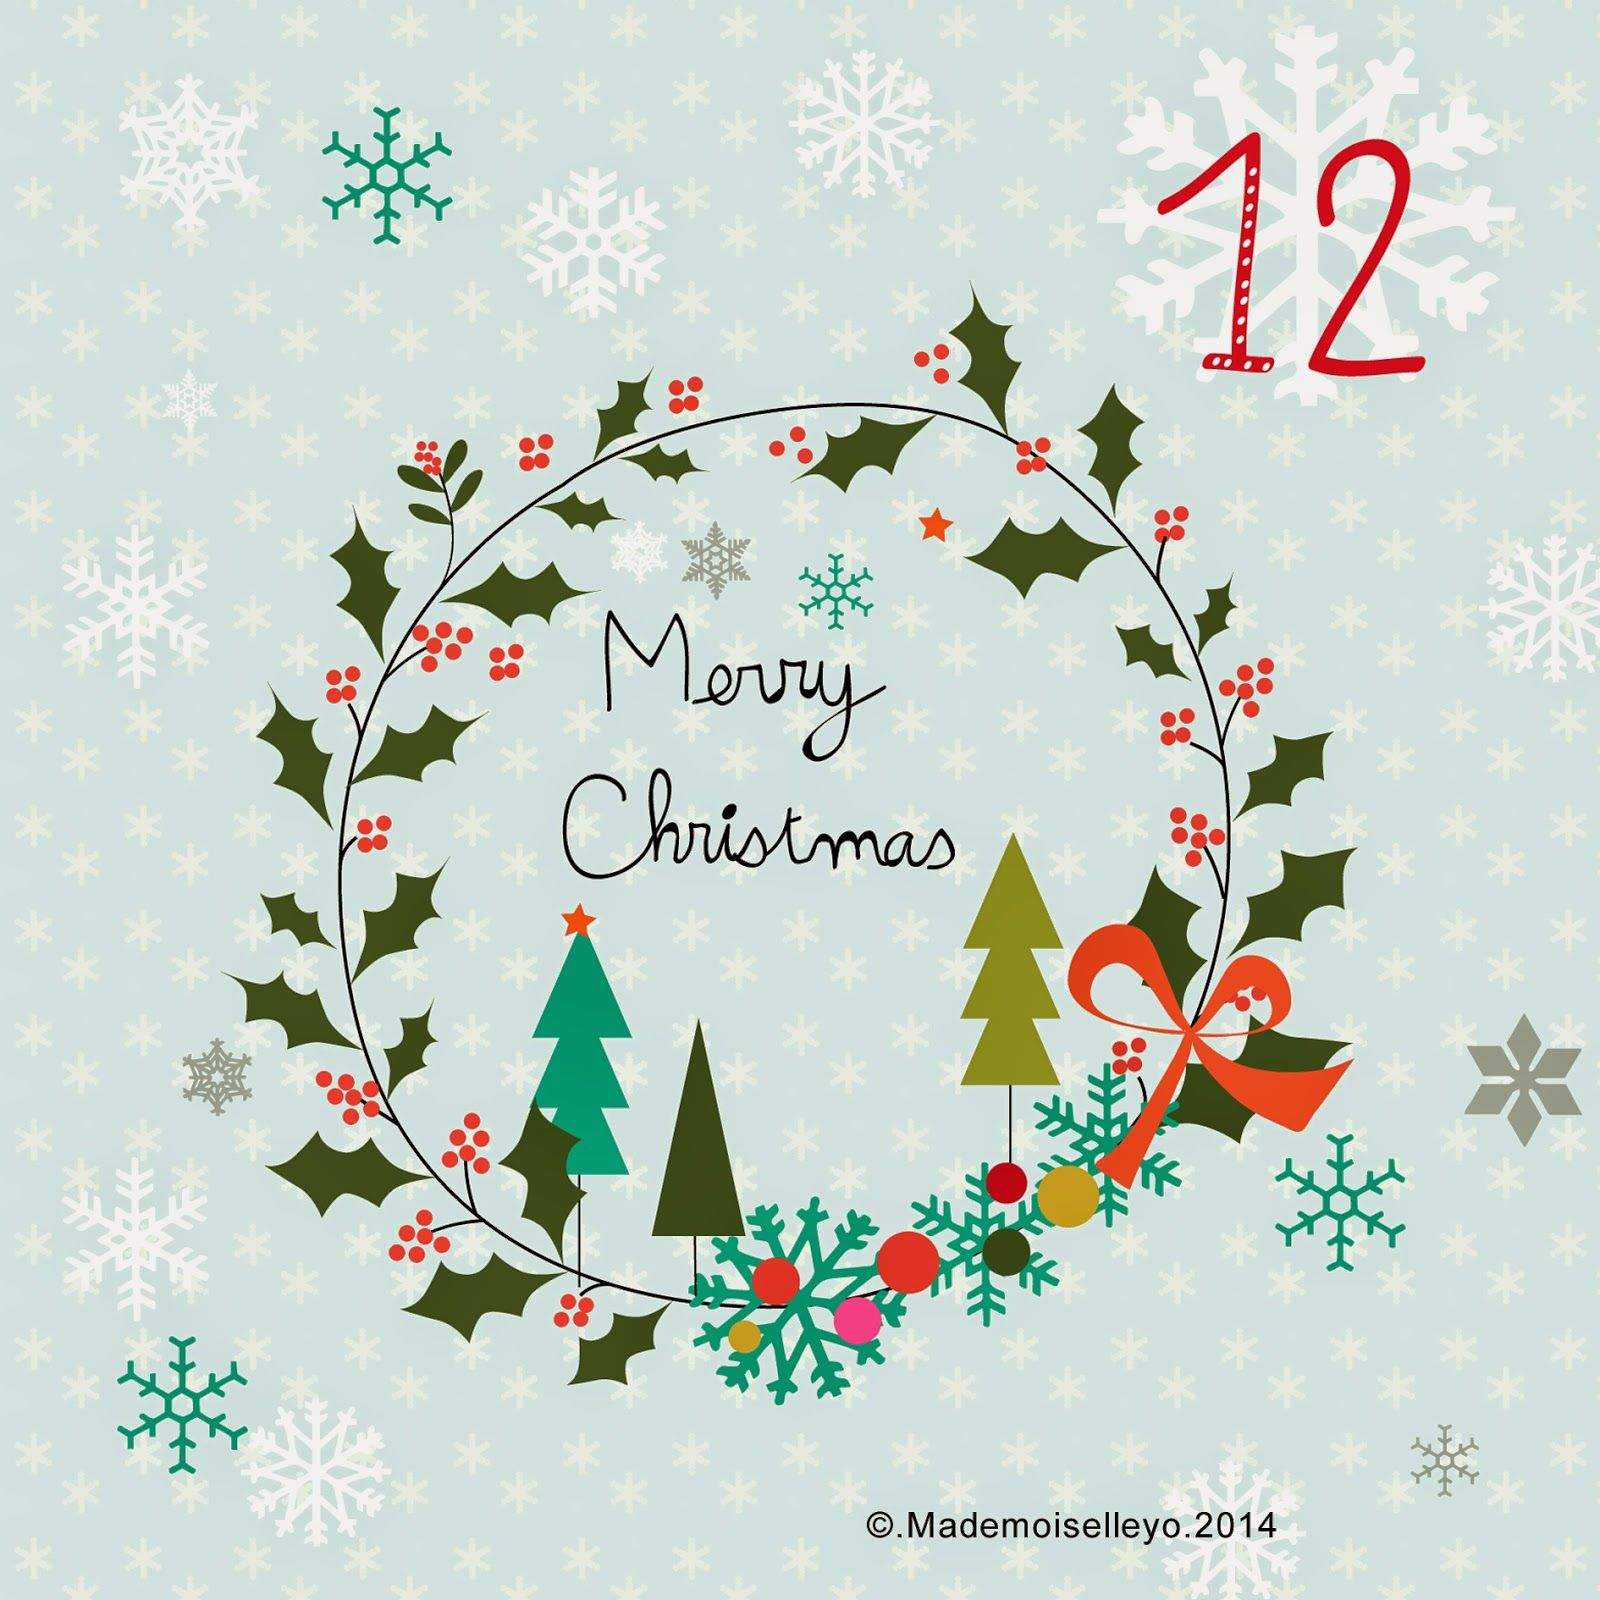 Mademoiselleyo Advent Calendar 12 13 14 Christmas DesignWinter ChristmasChristmas HolidayChristmas DecorChristmas IdeasChristmas ClipartChristmas